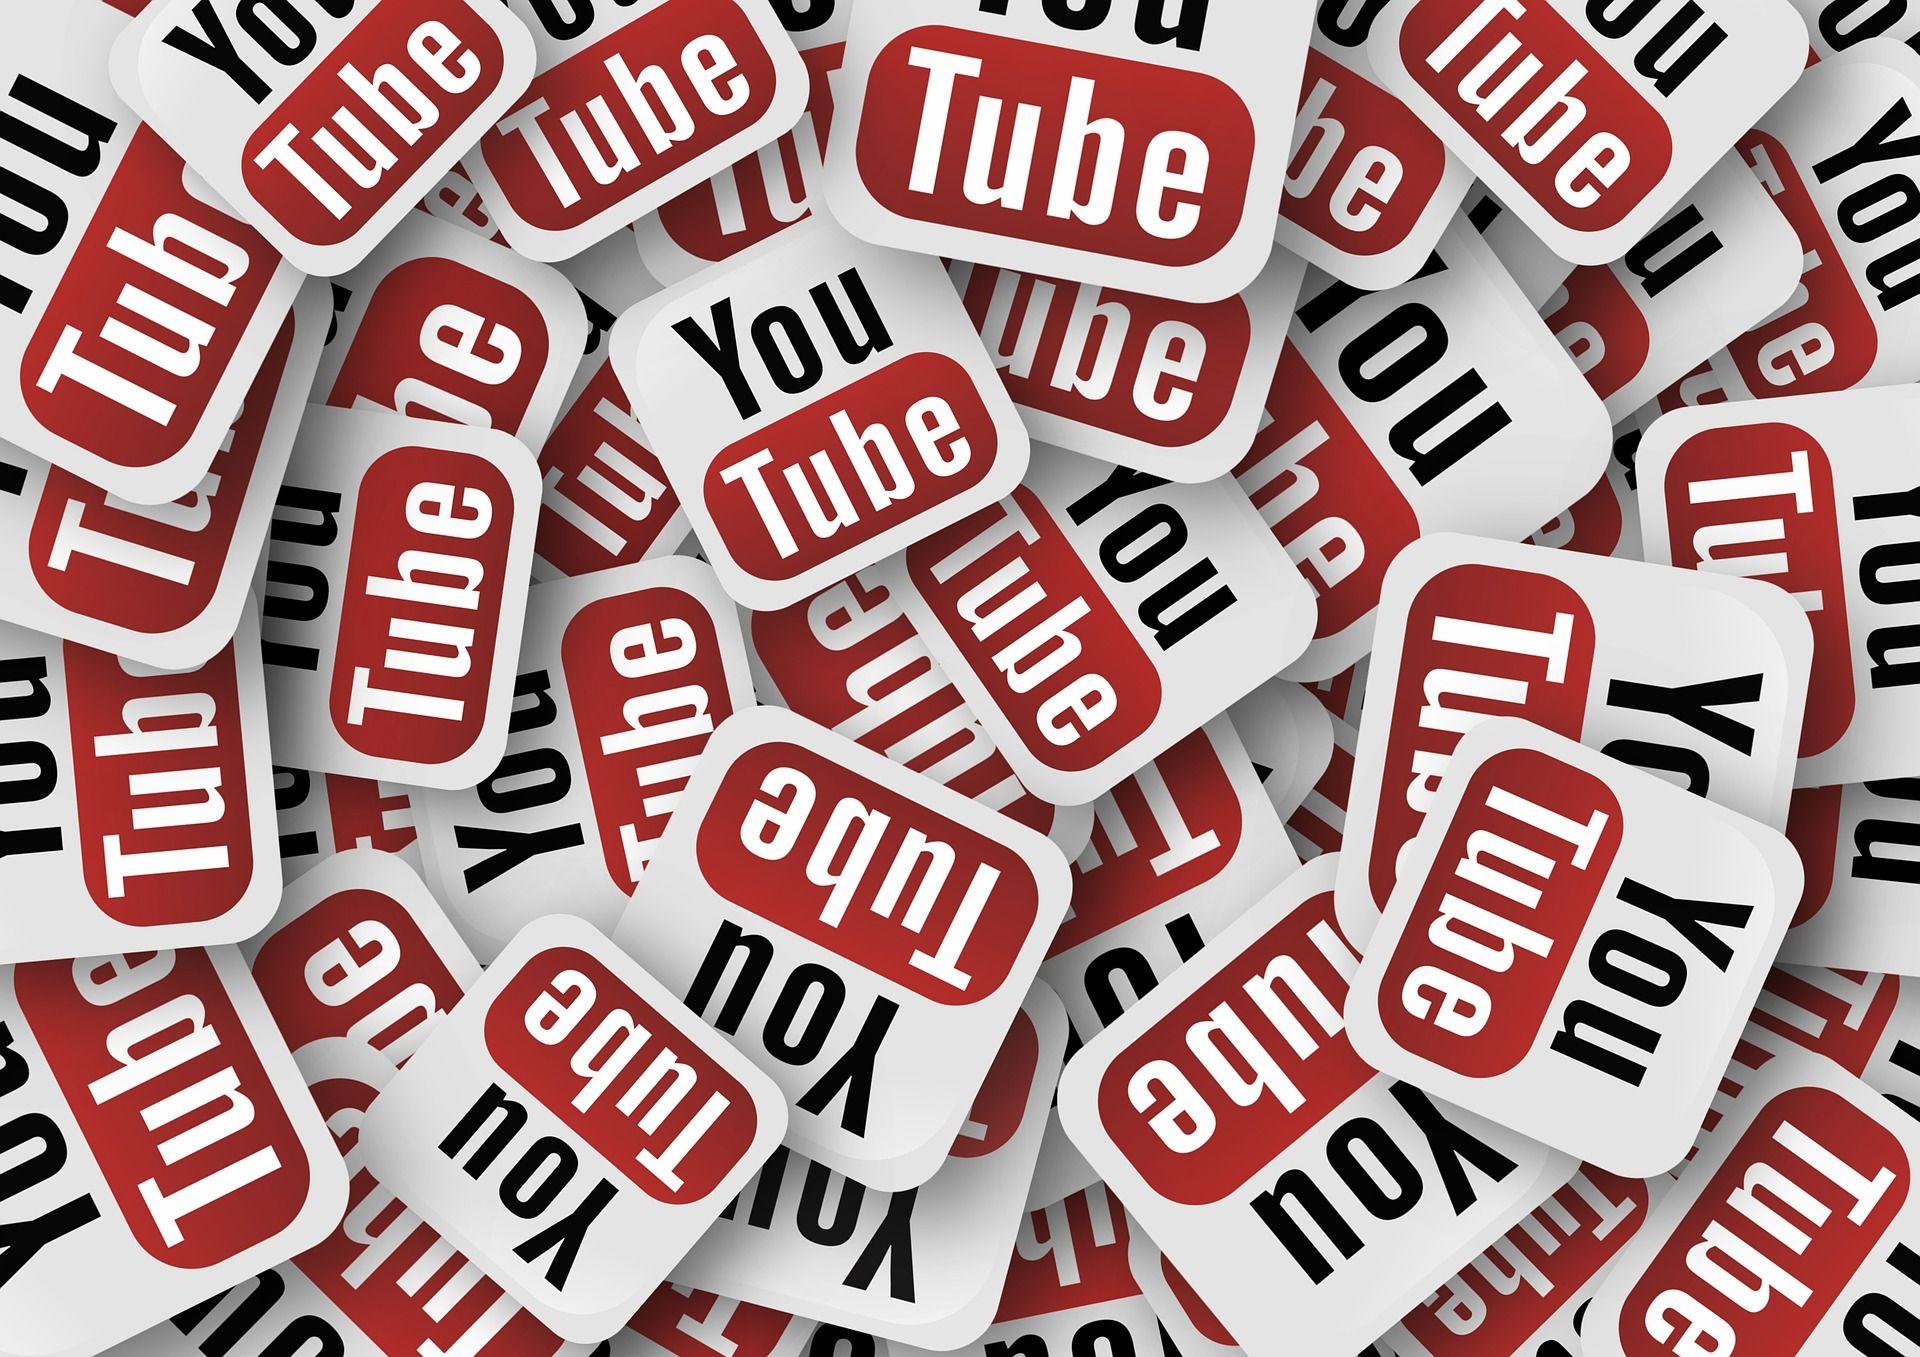 YouTube Leonard Wayne